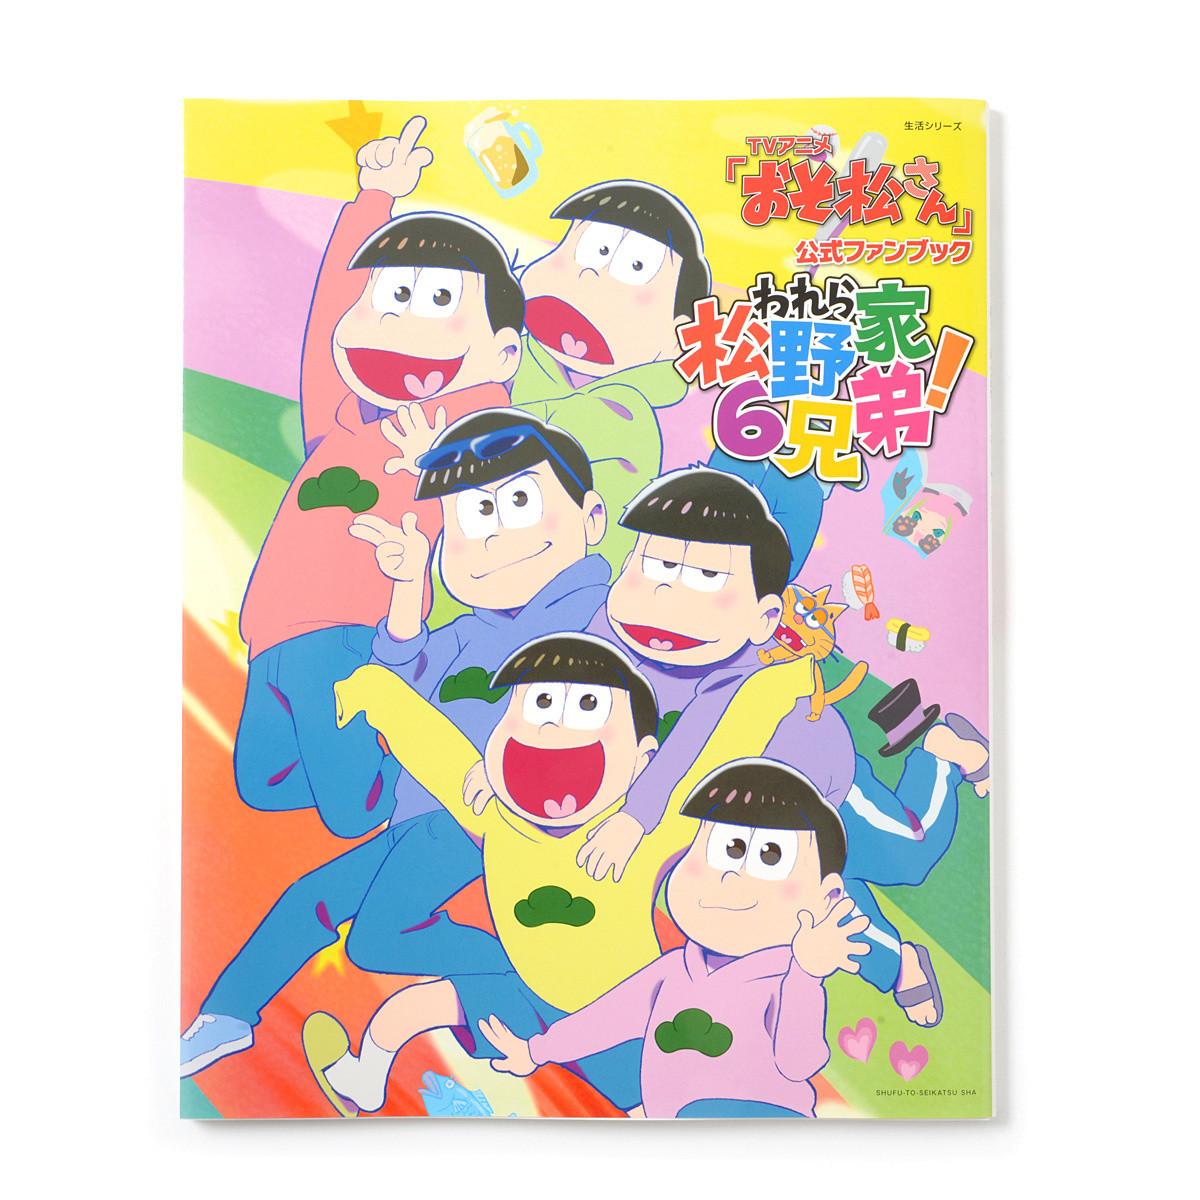 Anime Osomatsu San Official Fan Book Tokyo Otaku Mode Shop